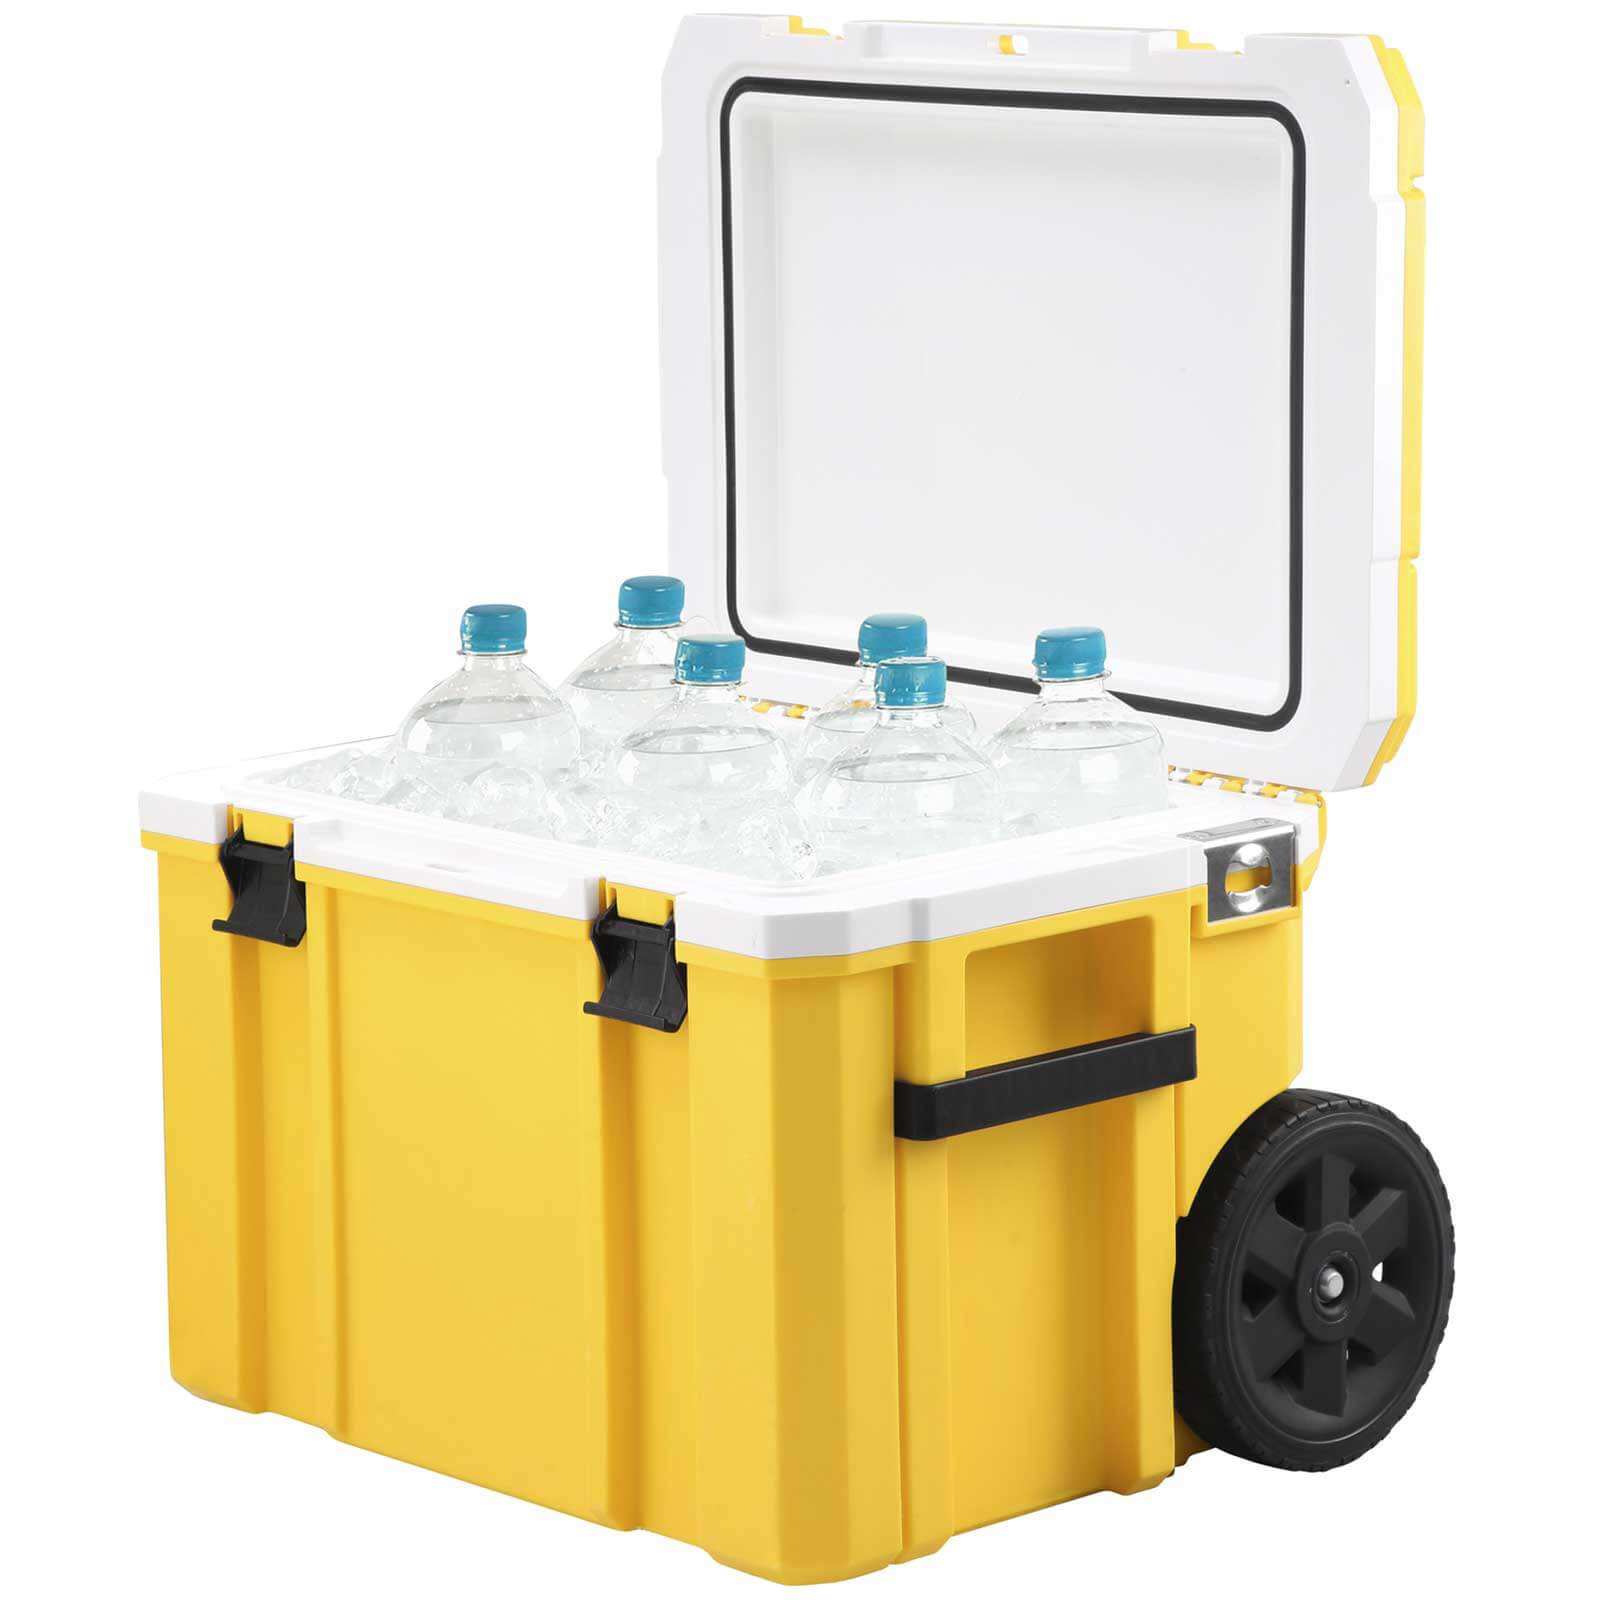 DeWalt TSTAK V2 Stackable Cool Box New 2020 Model